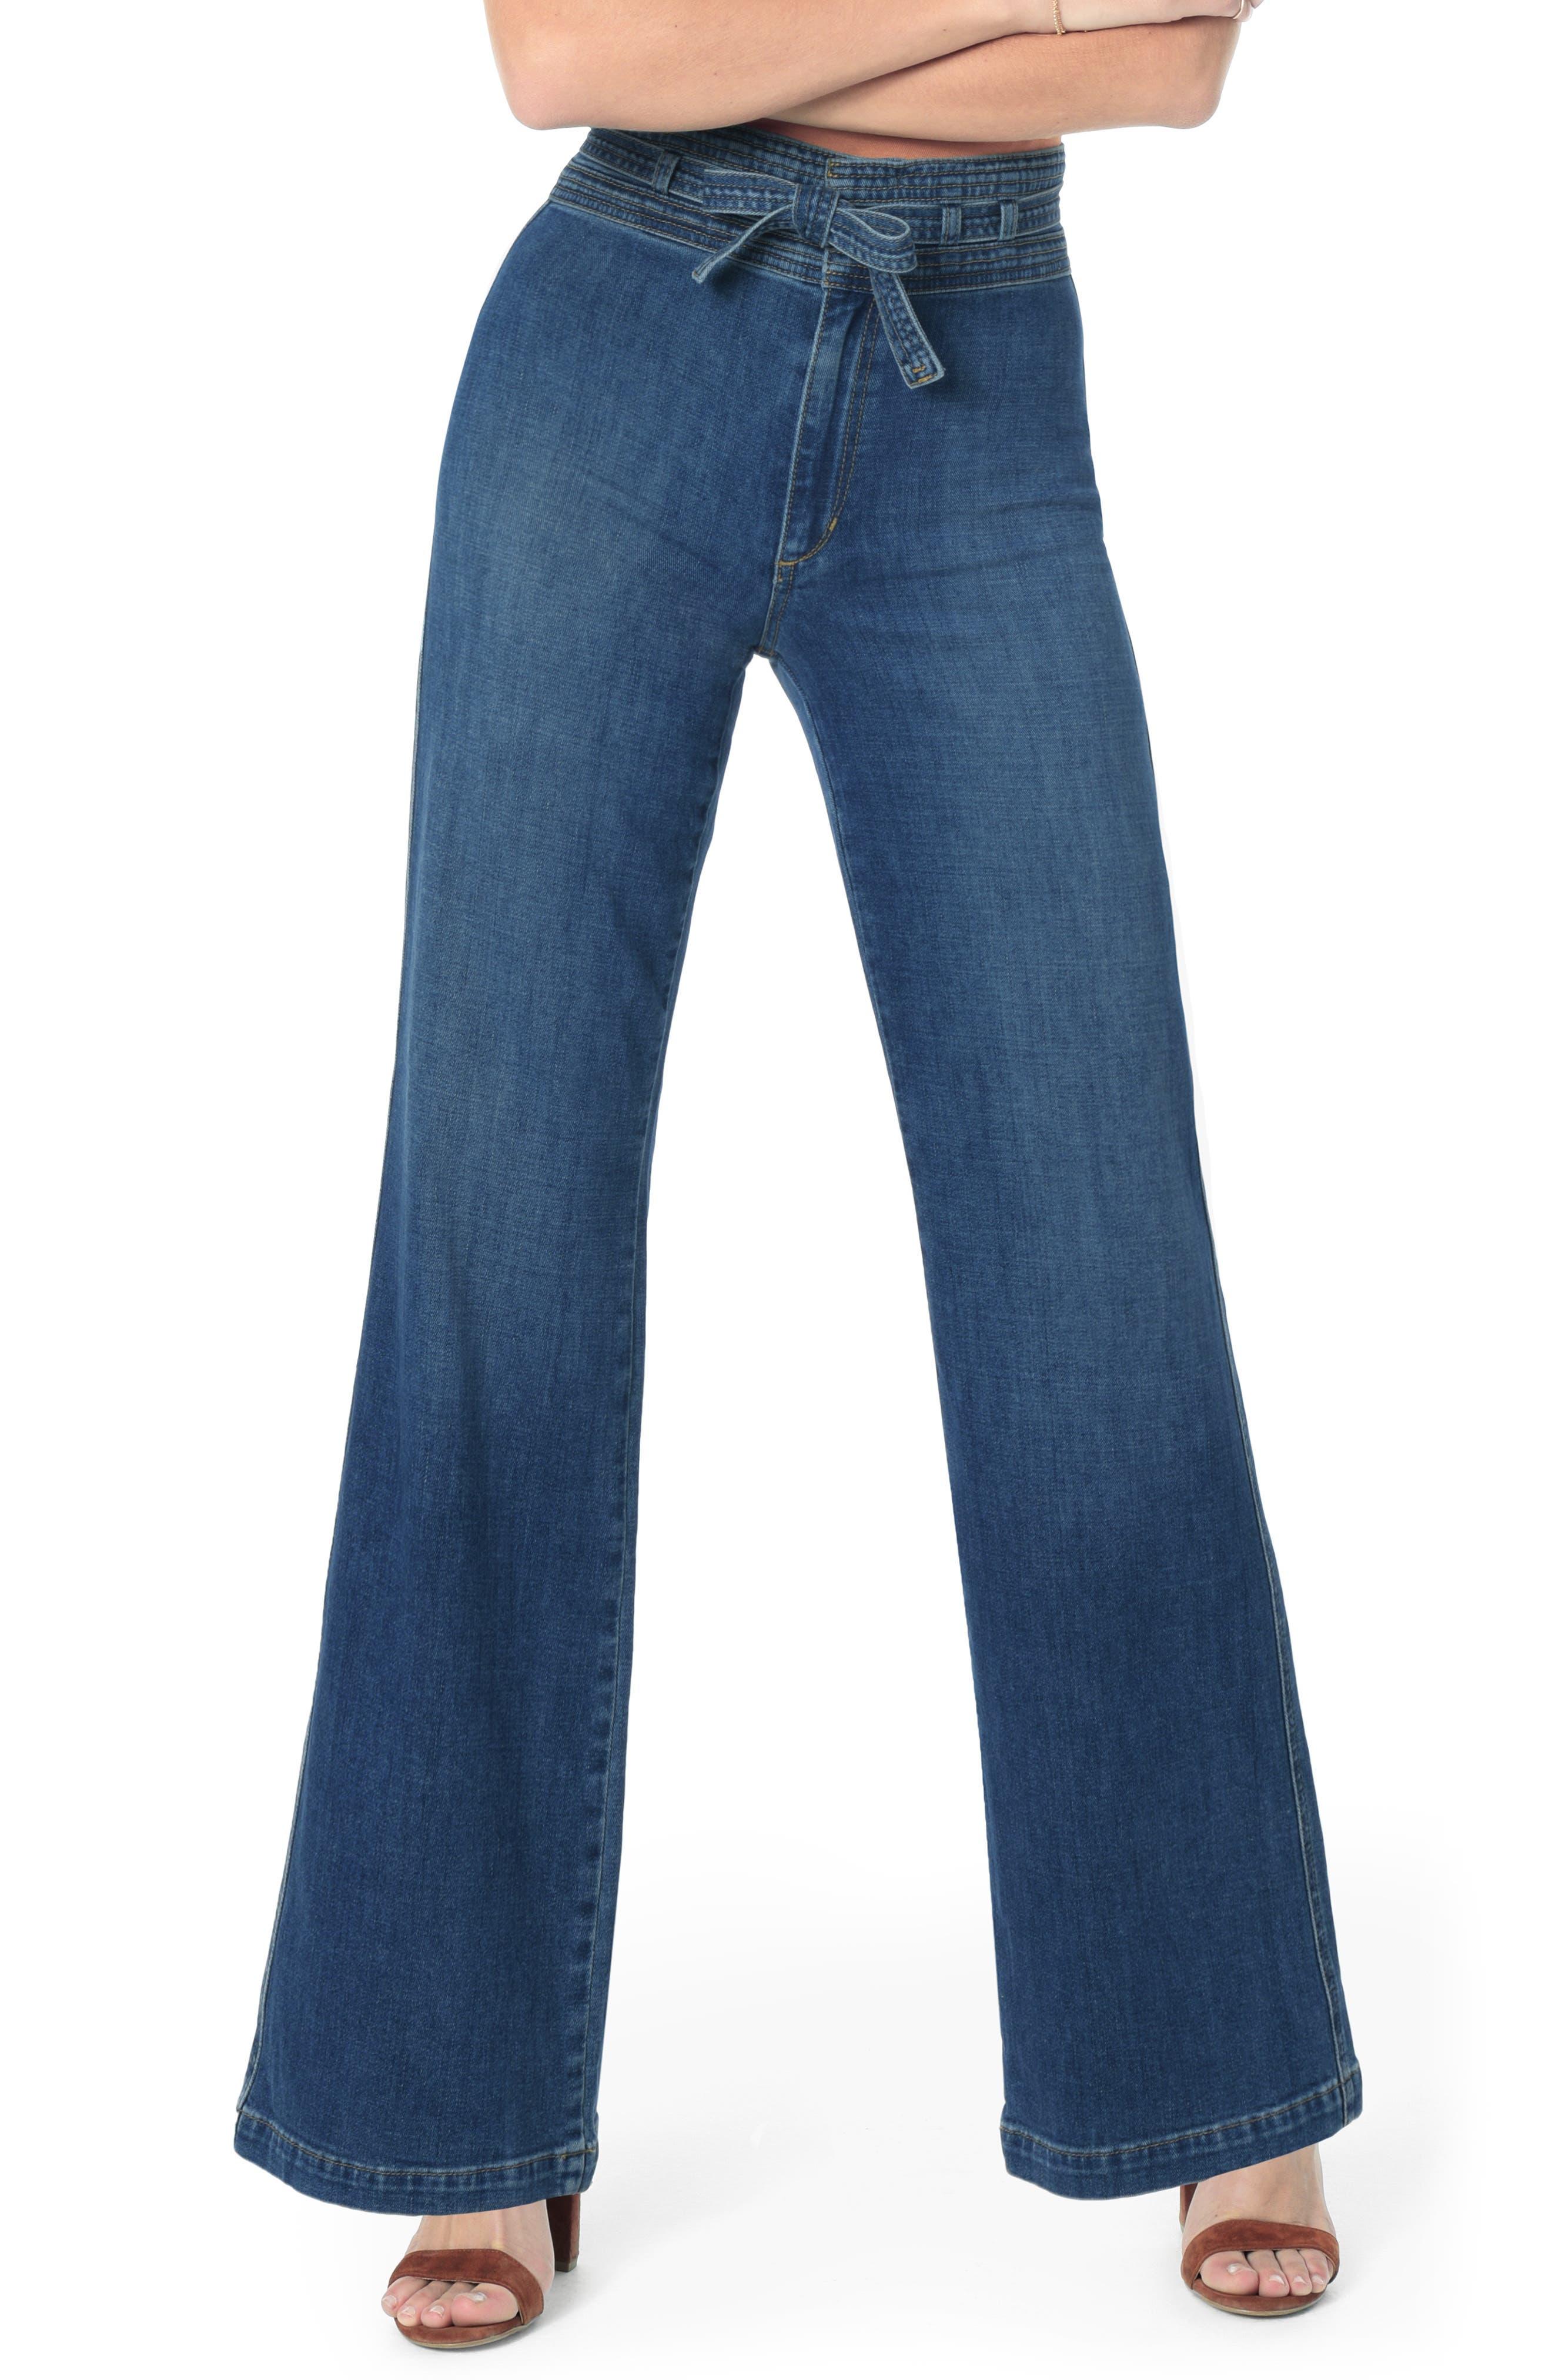 60s – 70s Pants, Jeans, Hippie, Bell Bottoms, Jumpsuits Womens Joes High Waist Flare Jeans Size 28 - Blue $124.80 AT vintagedancer.com